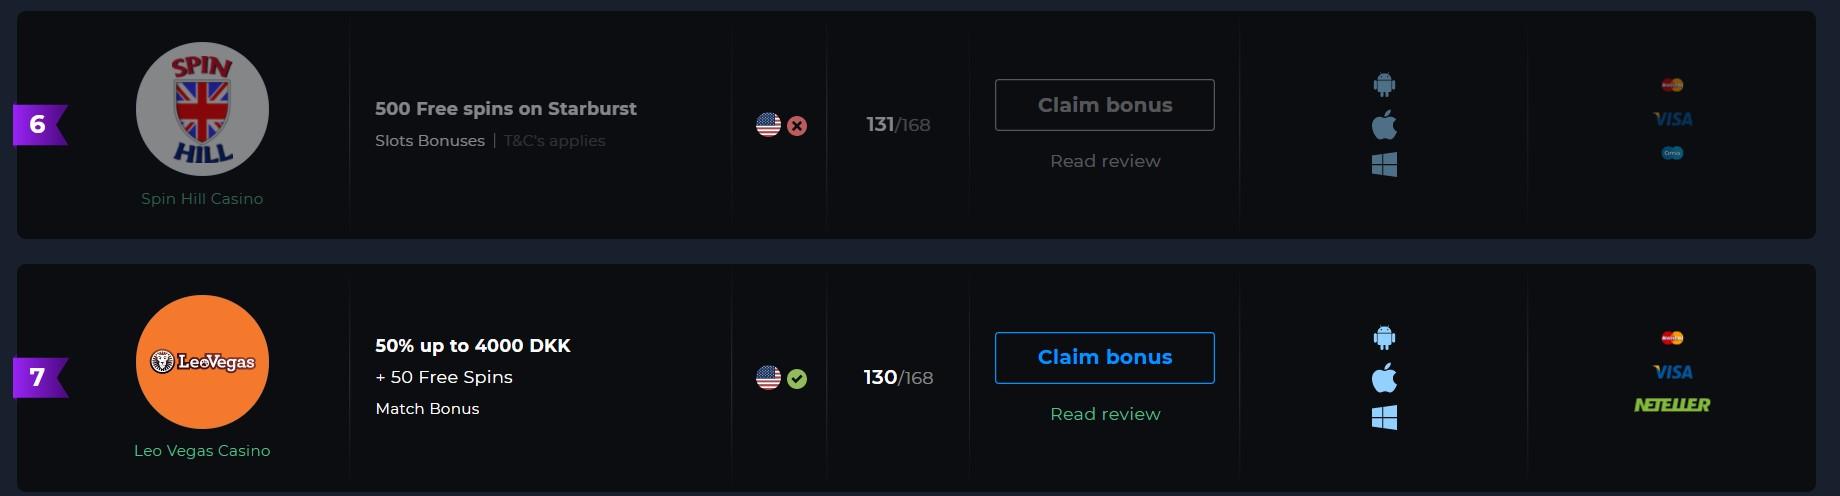 How to Claim 500 Free Spins Bonus